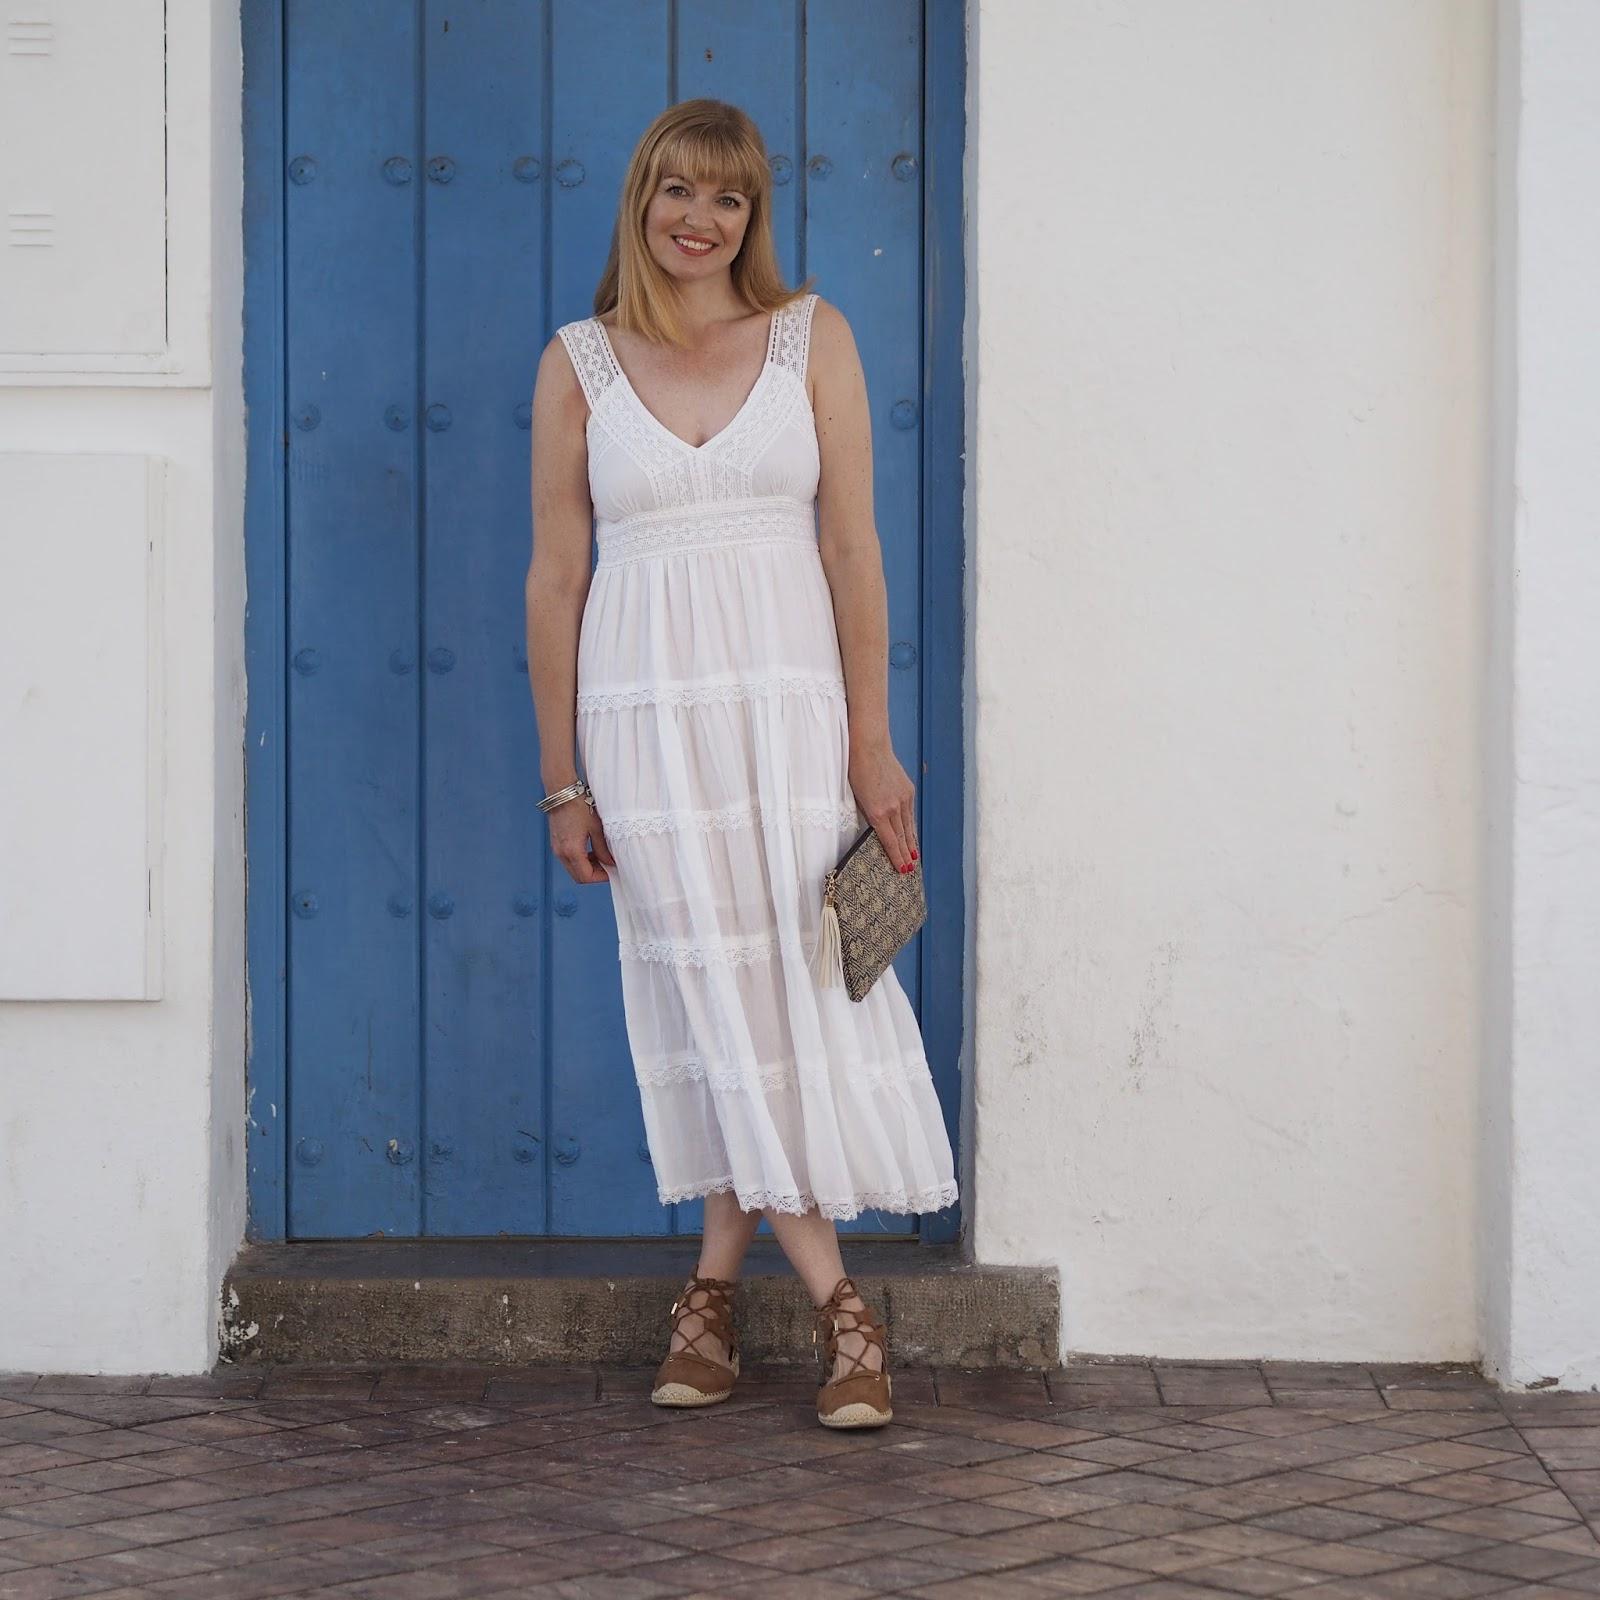 White summer midi dress and espadrilles, Nerja